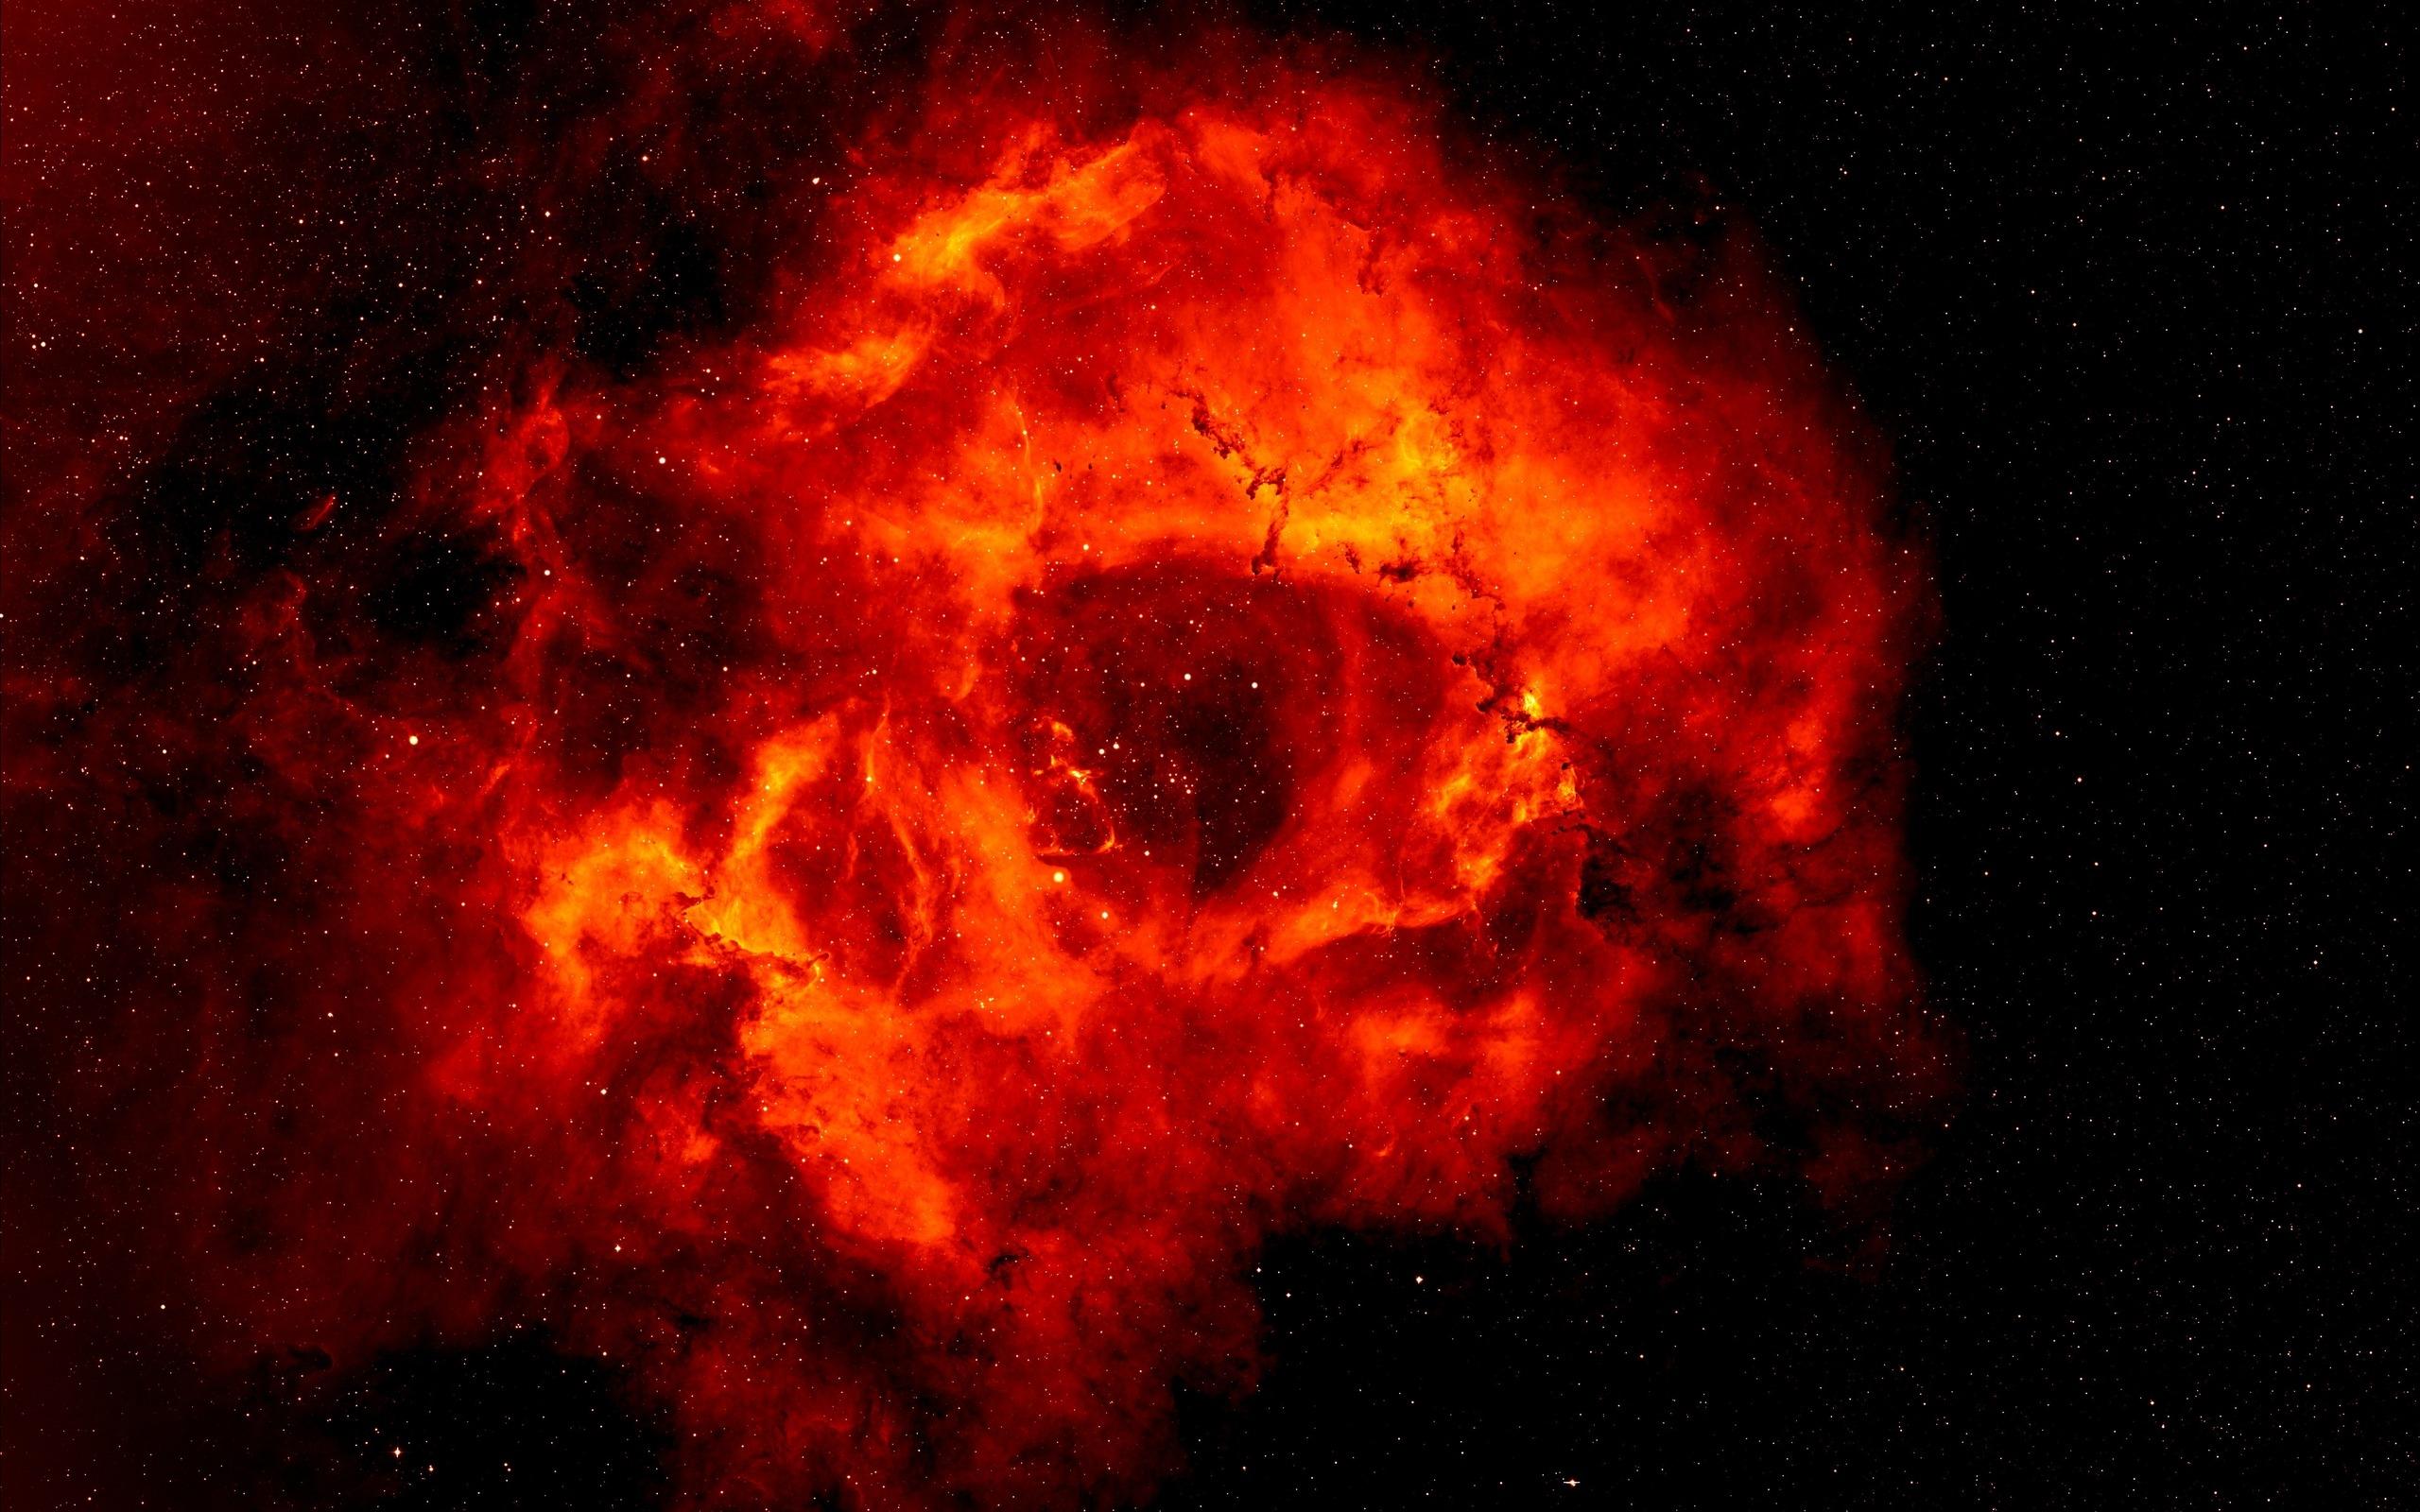 rosette nebula wallpaper - photo #8